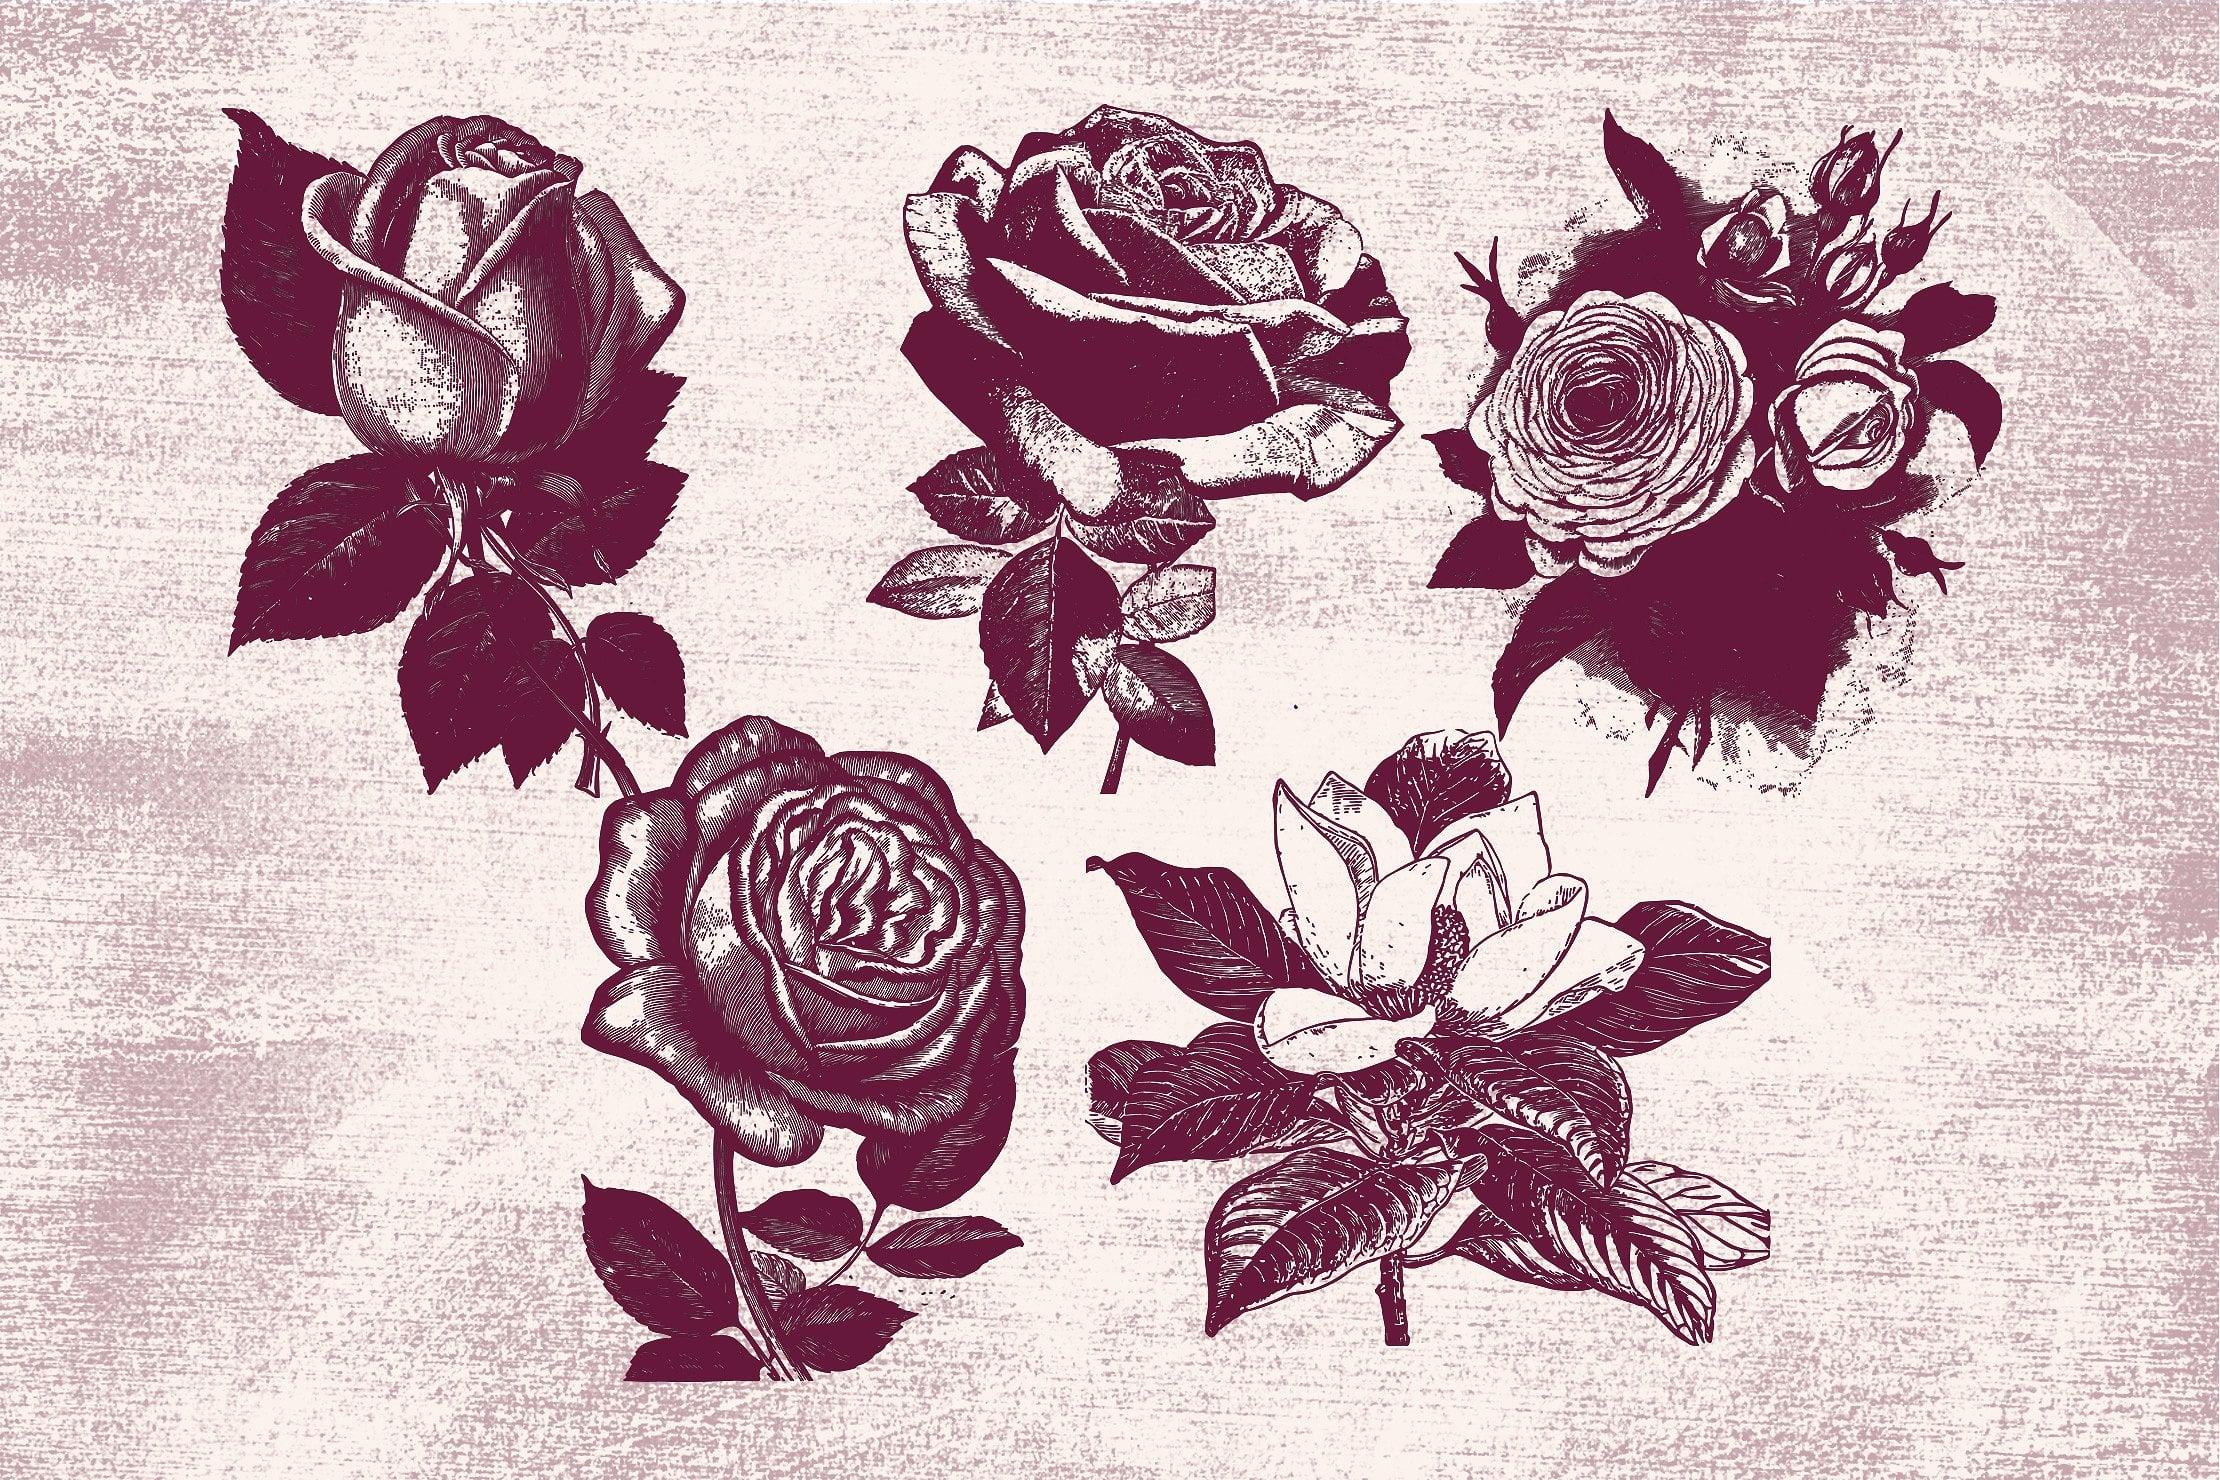 96 Floral Vintage Vector Illustrations [96 Items, EPS + PNG] - flowers 4